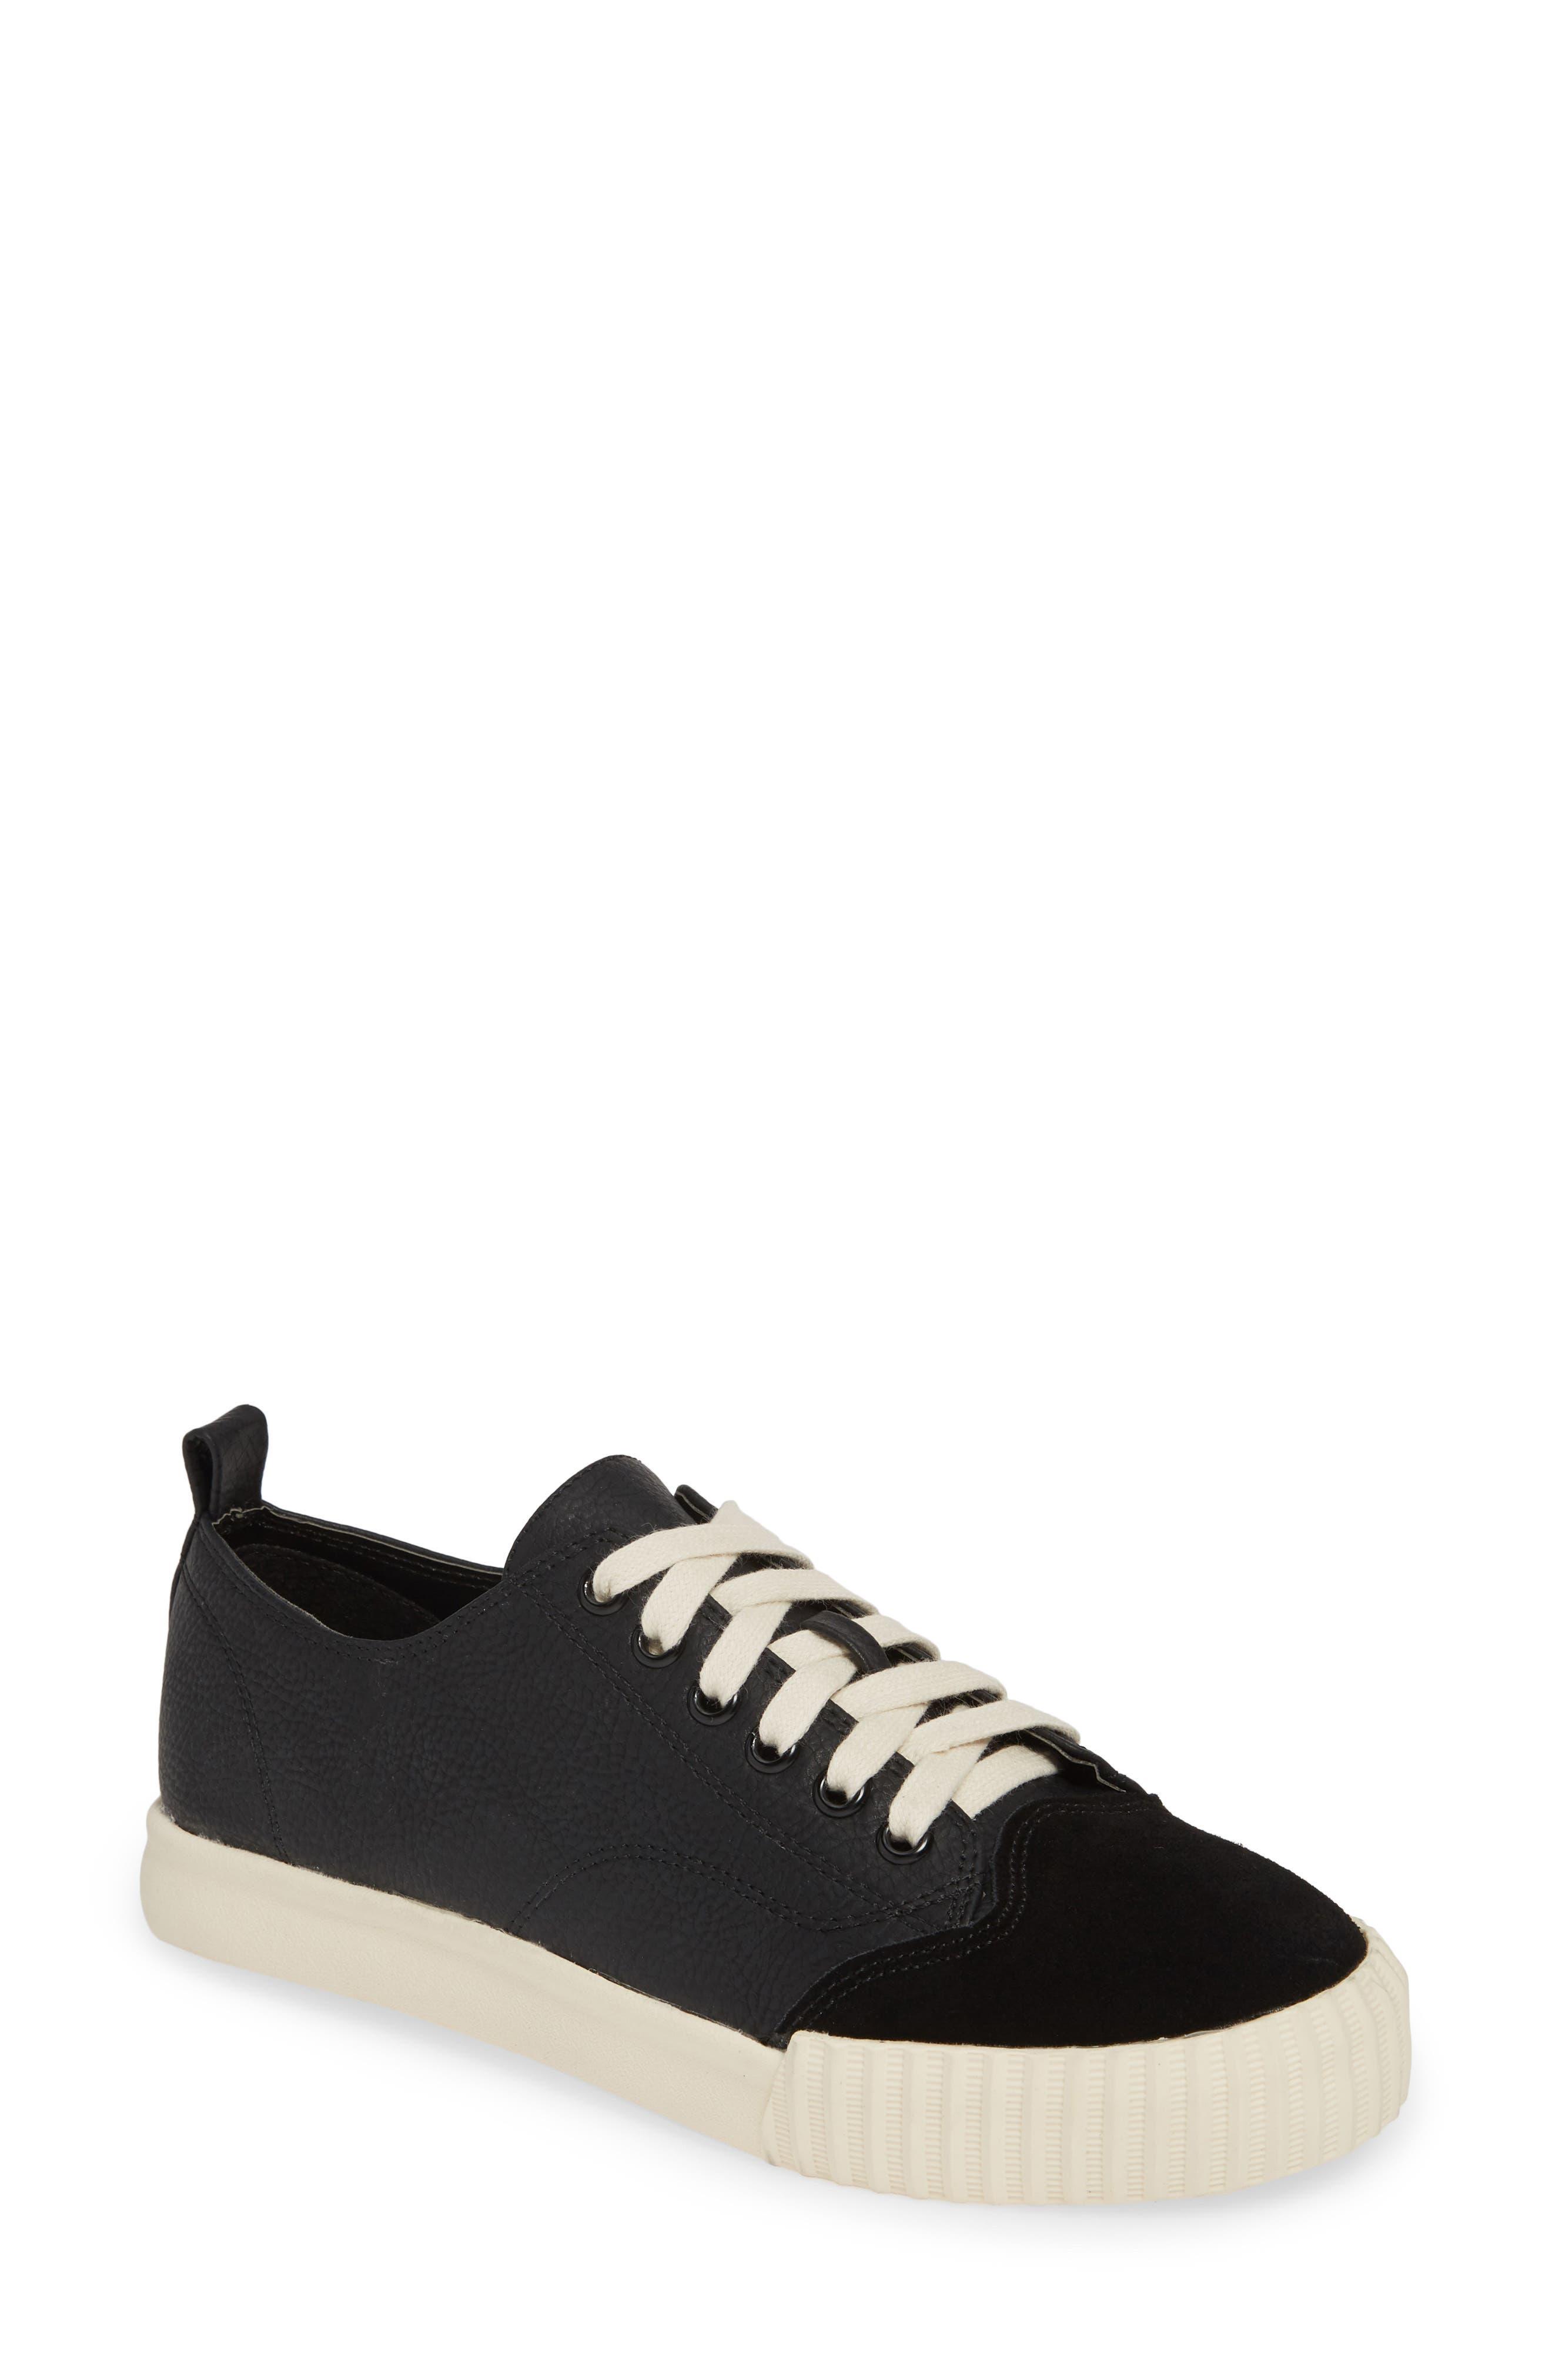 Mia Grayson Sneaker- Black